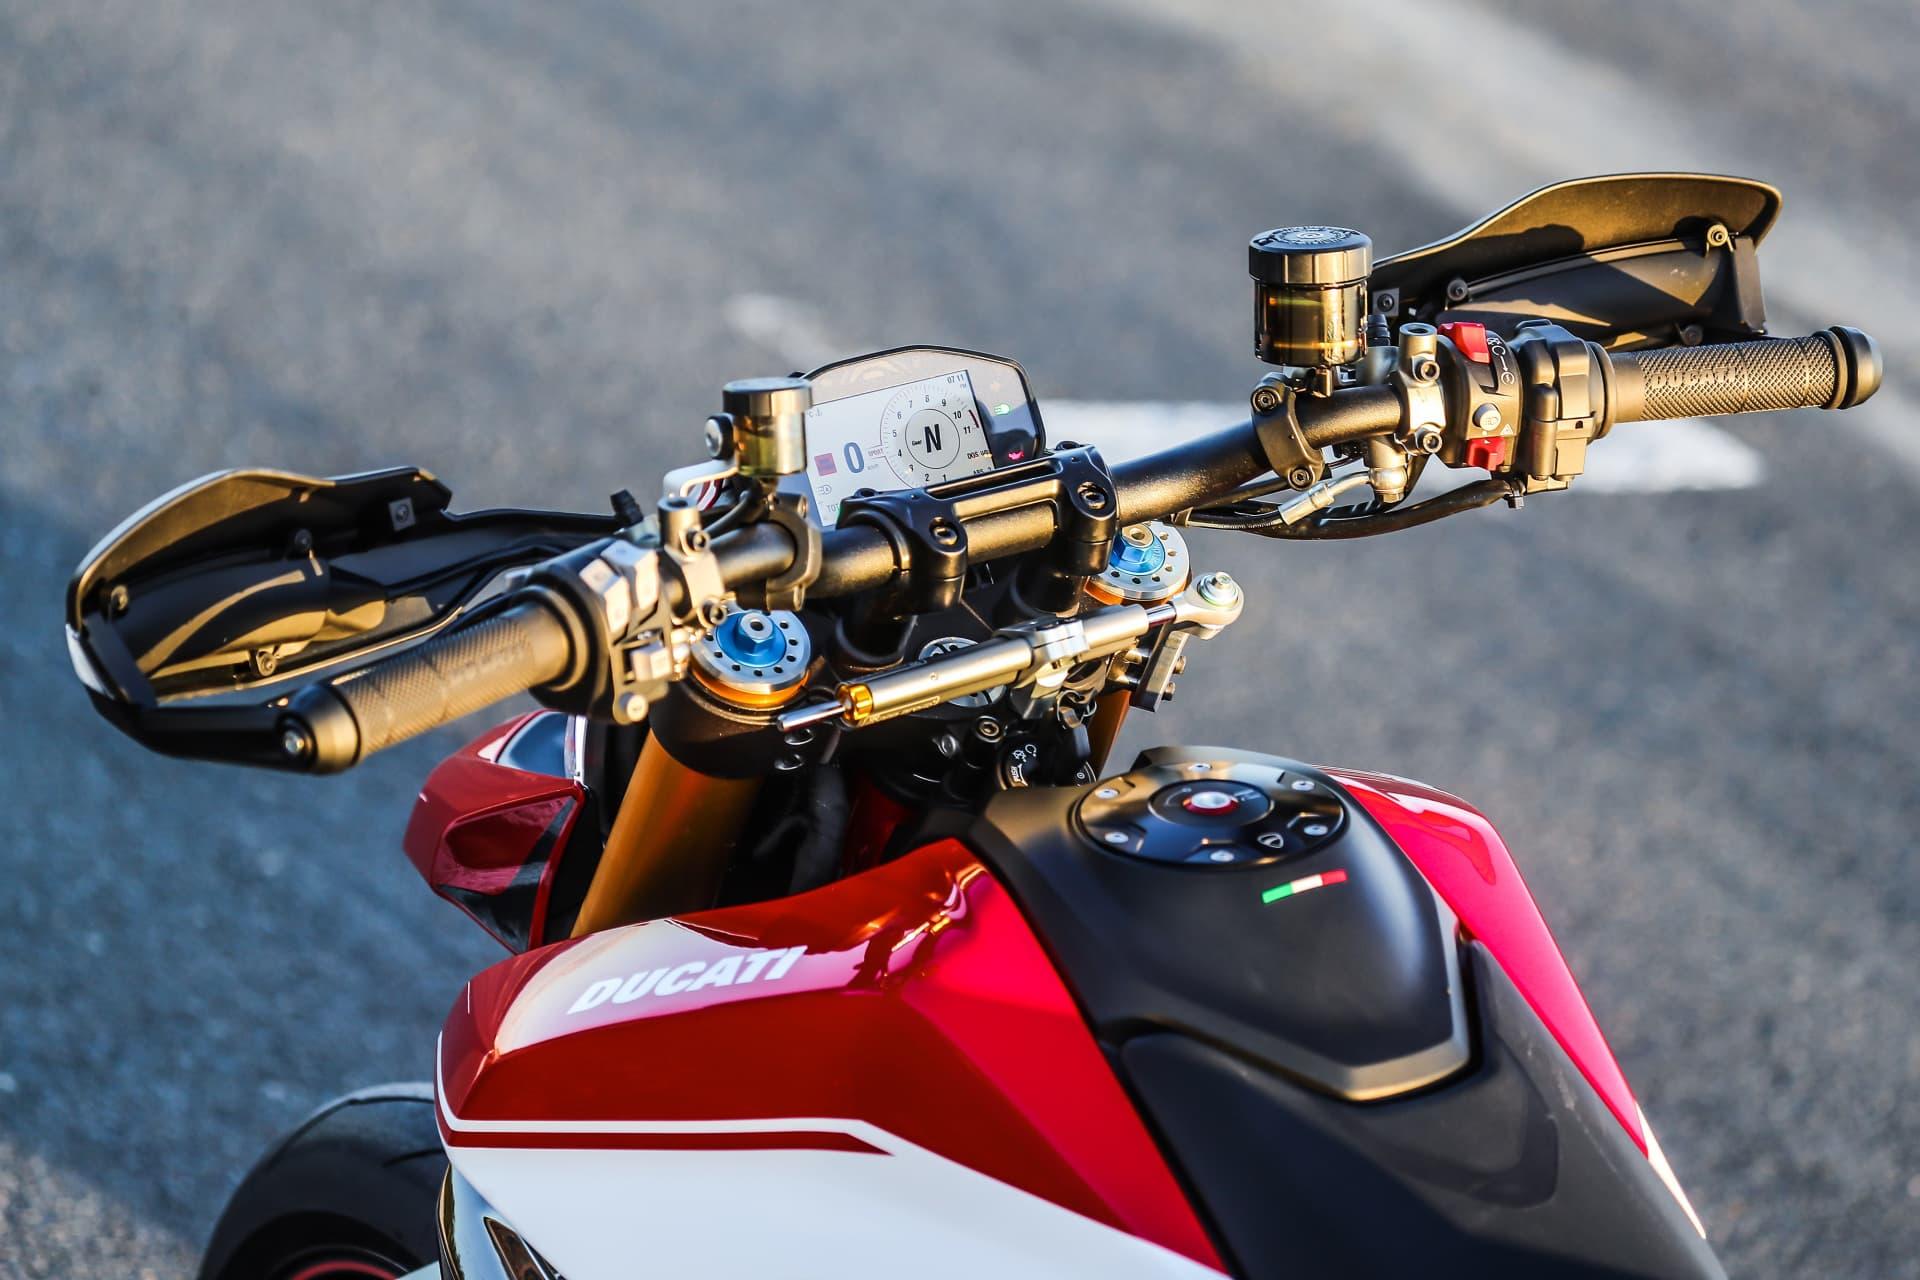 Ducati Hypermotard 950 Sp Static 38 Uc70297 Mid